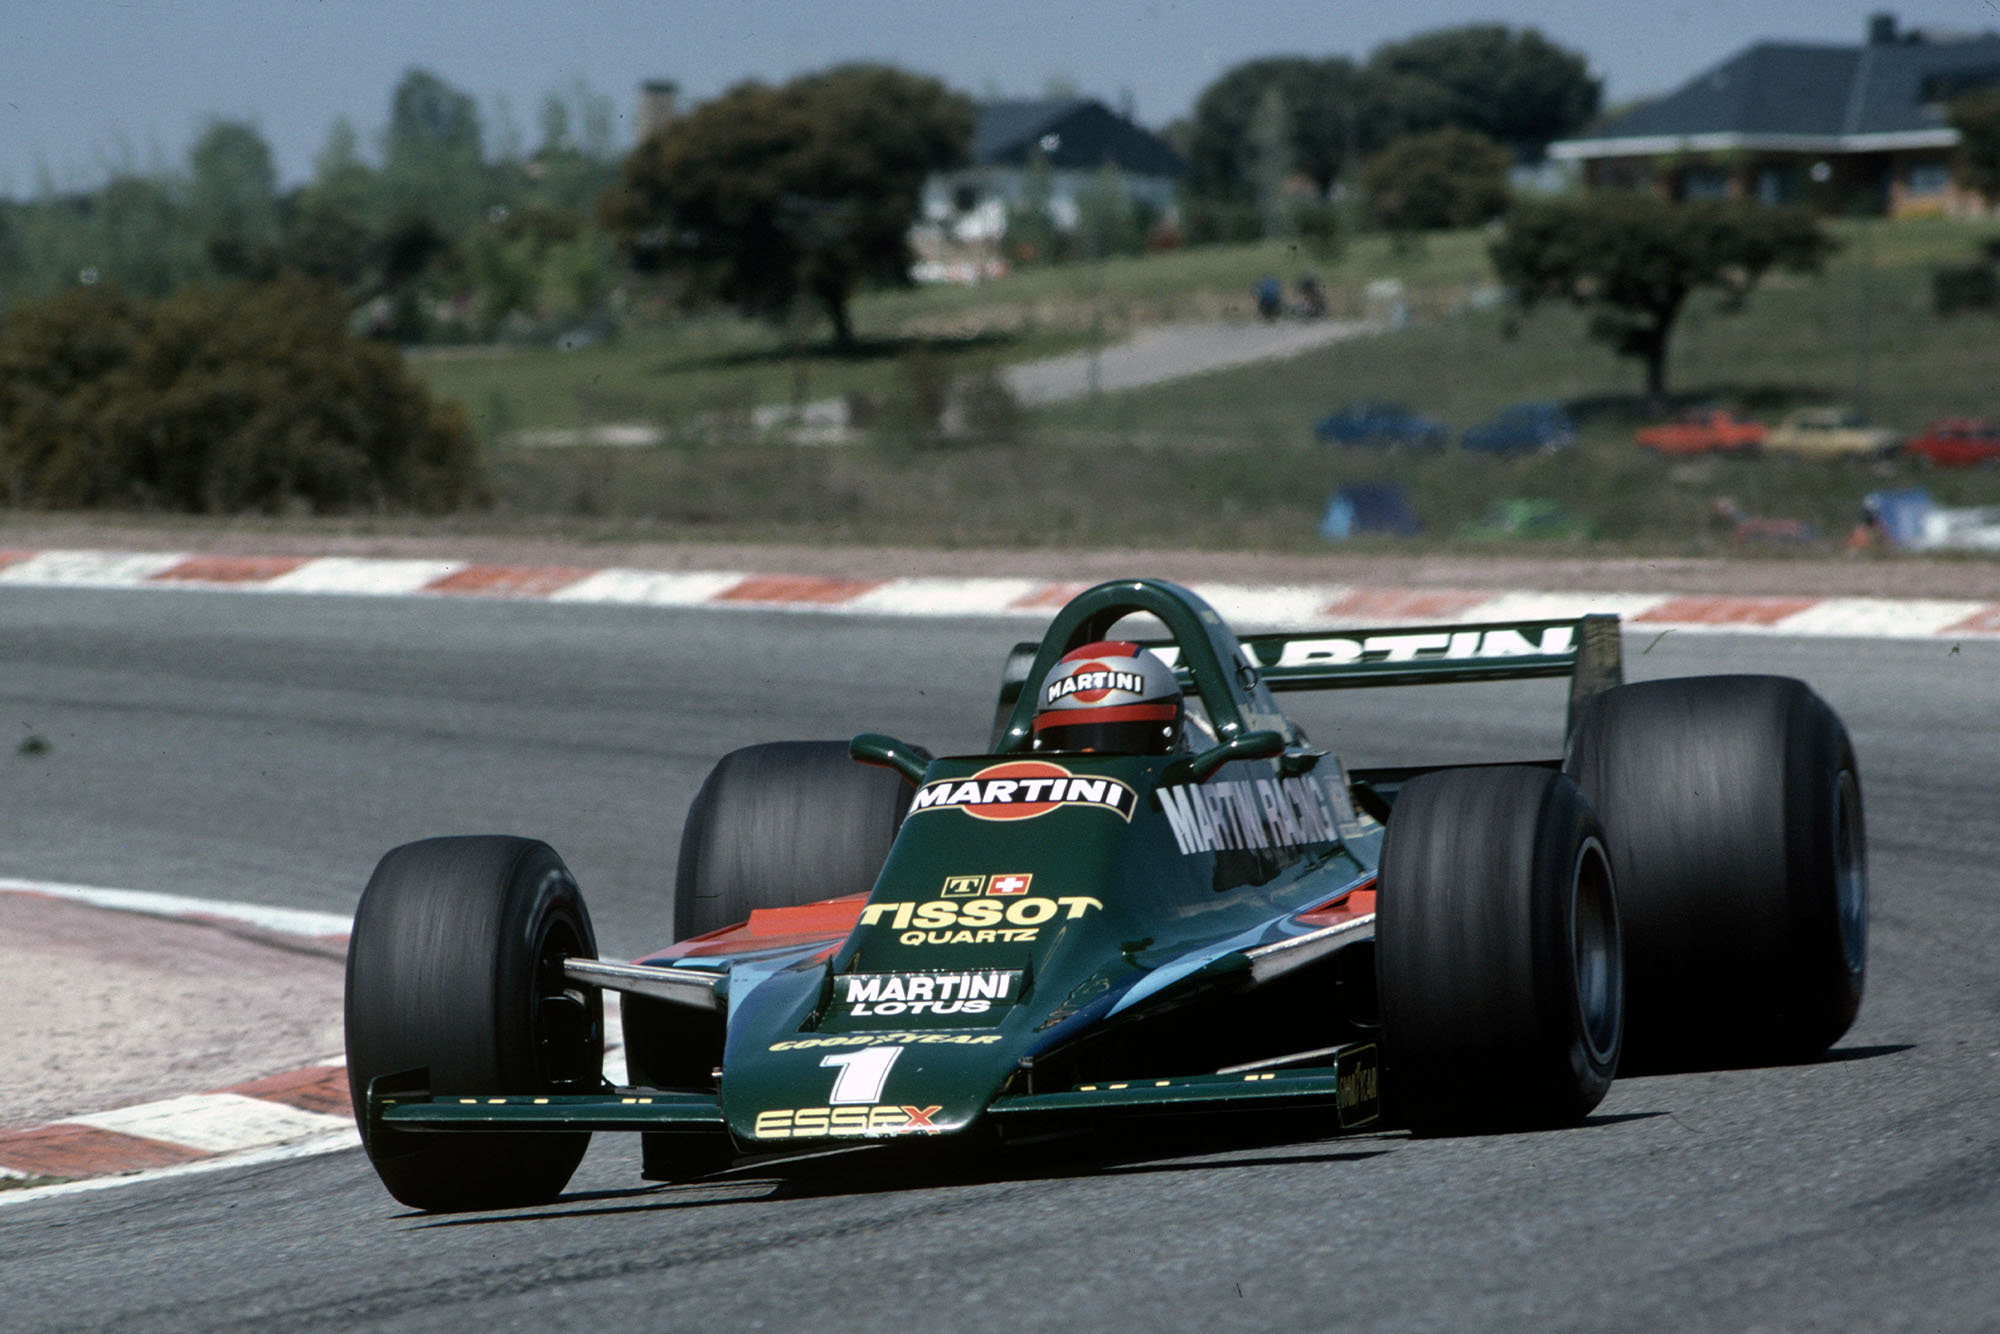 Mario Andretti (Lotus) driving at the 1979 Spanish Grand Prix, Jarama.